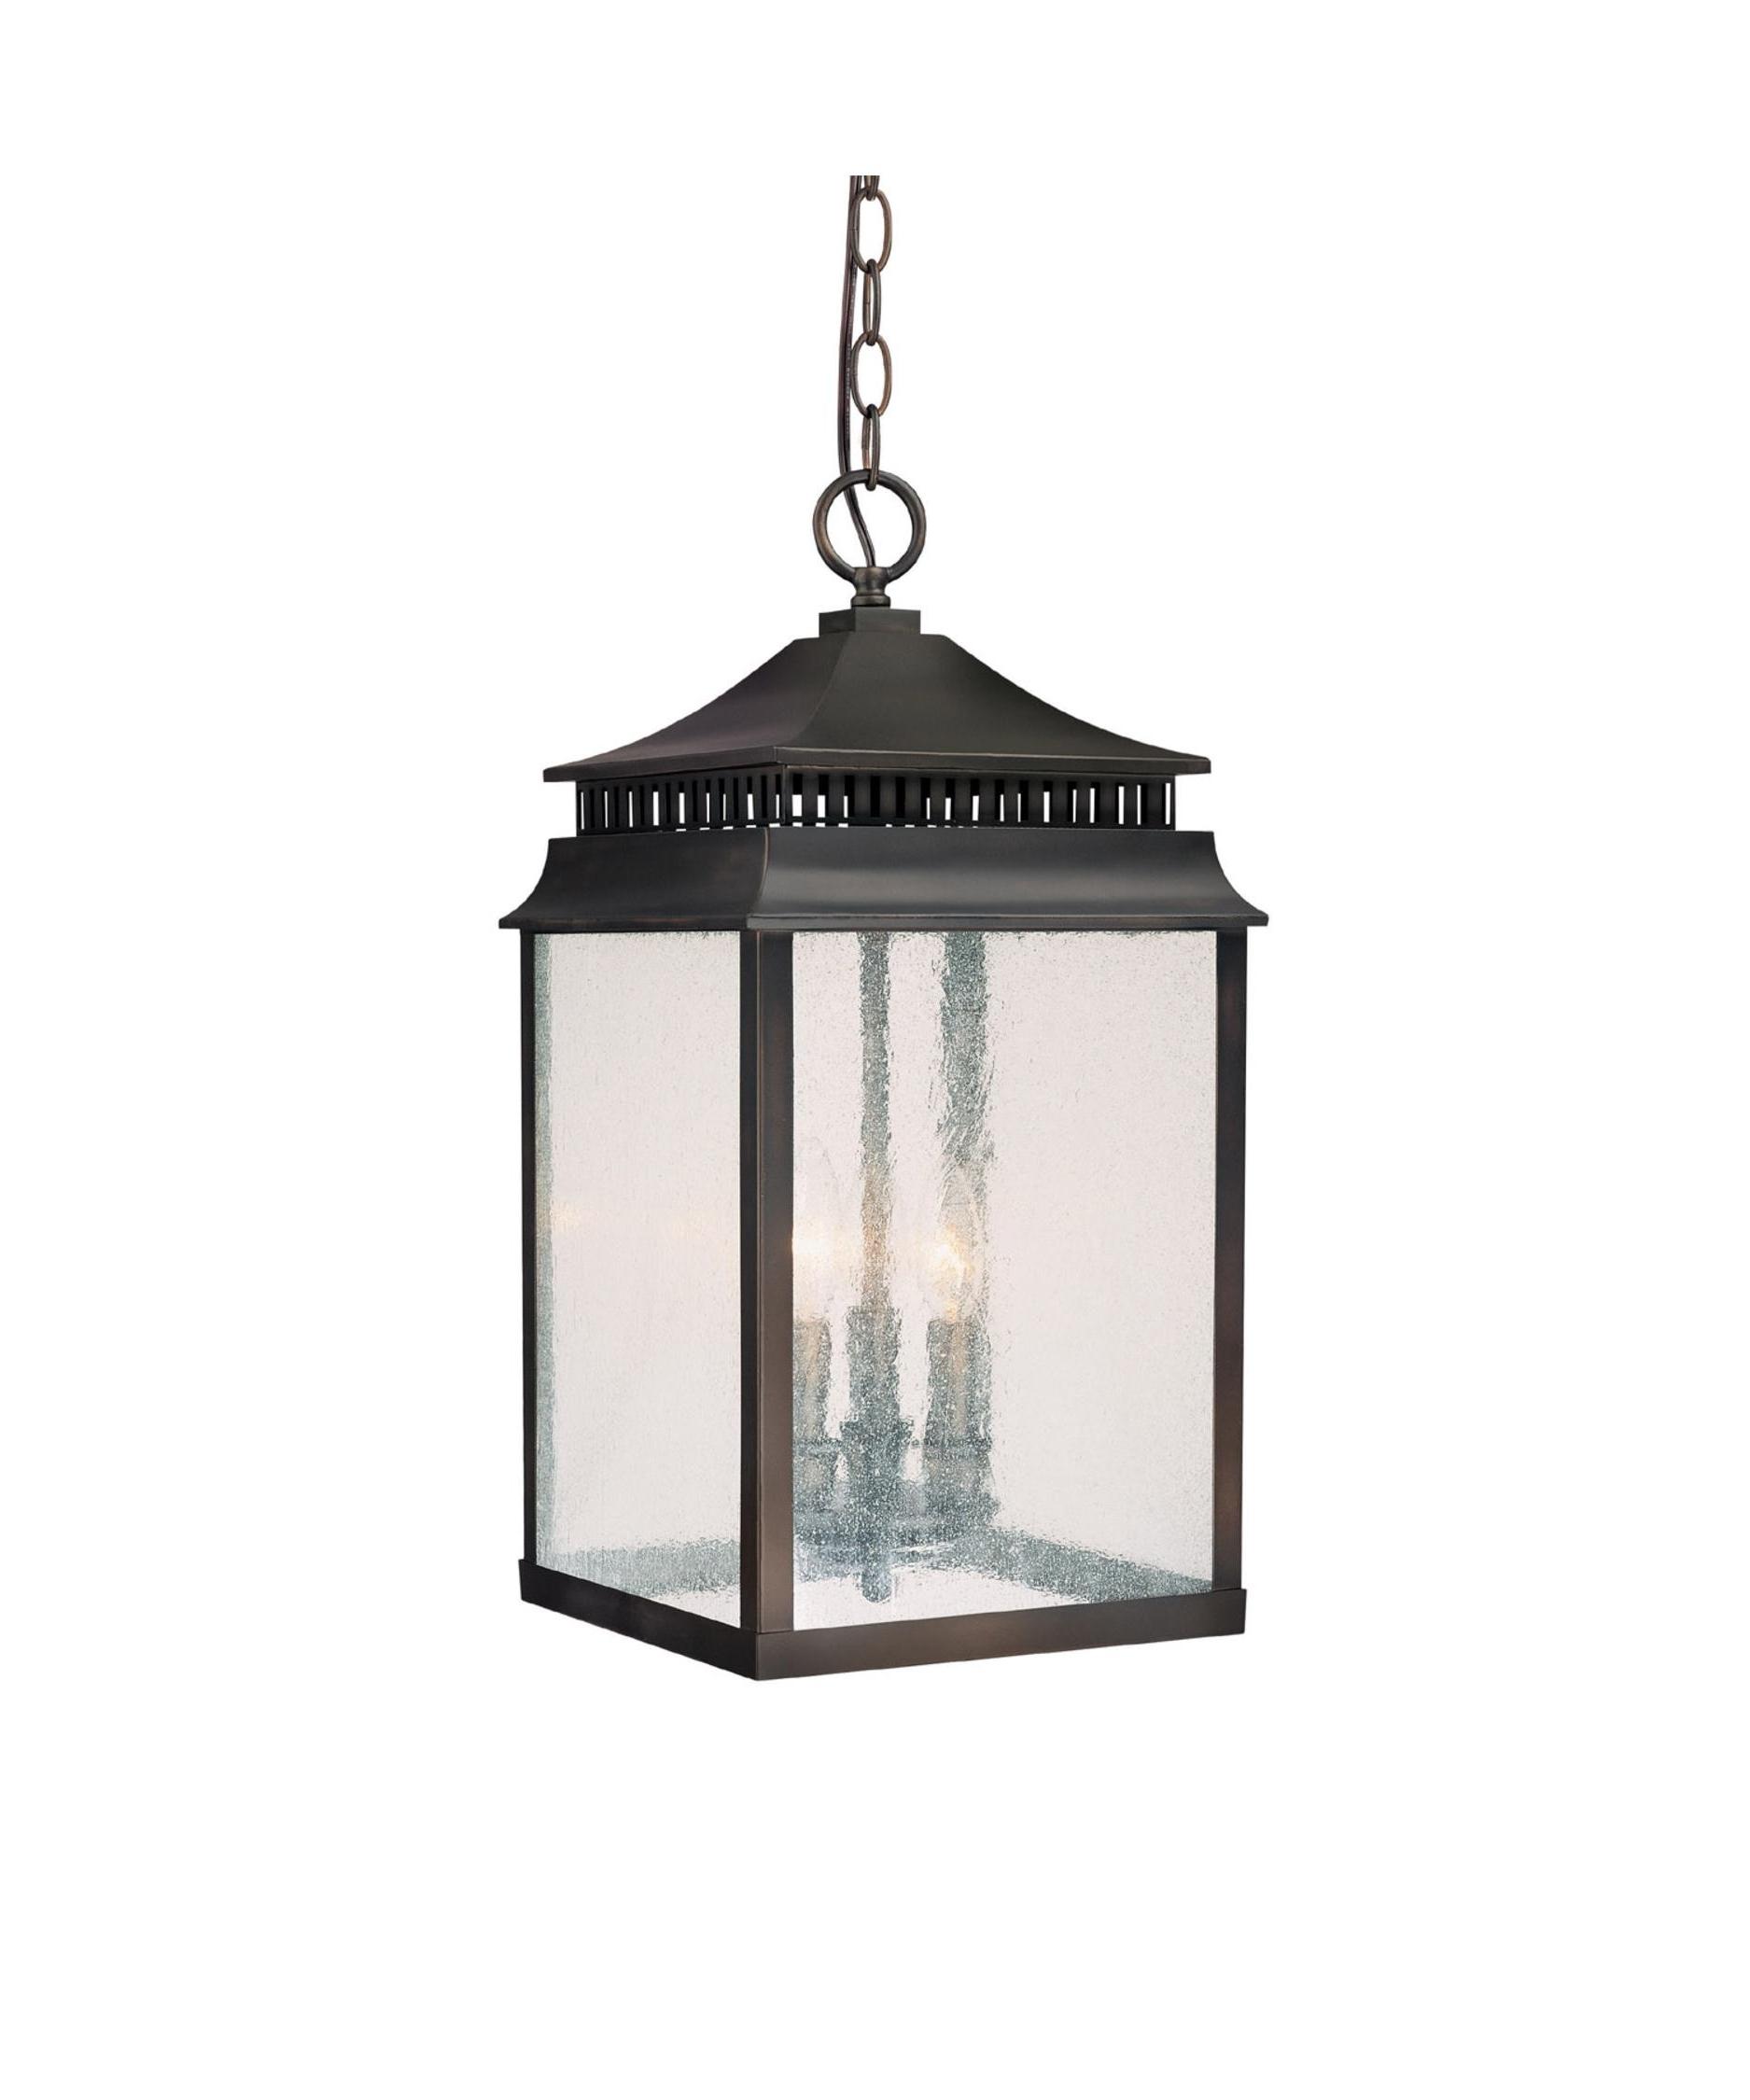 Outdoor Hanging Lantern Lights In Most Recent Capital Lighting 9116 Sutter Creek 10 Inch Wide 3 Light Outdoor (View 8 of 20)